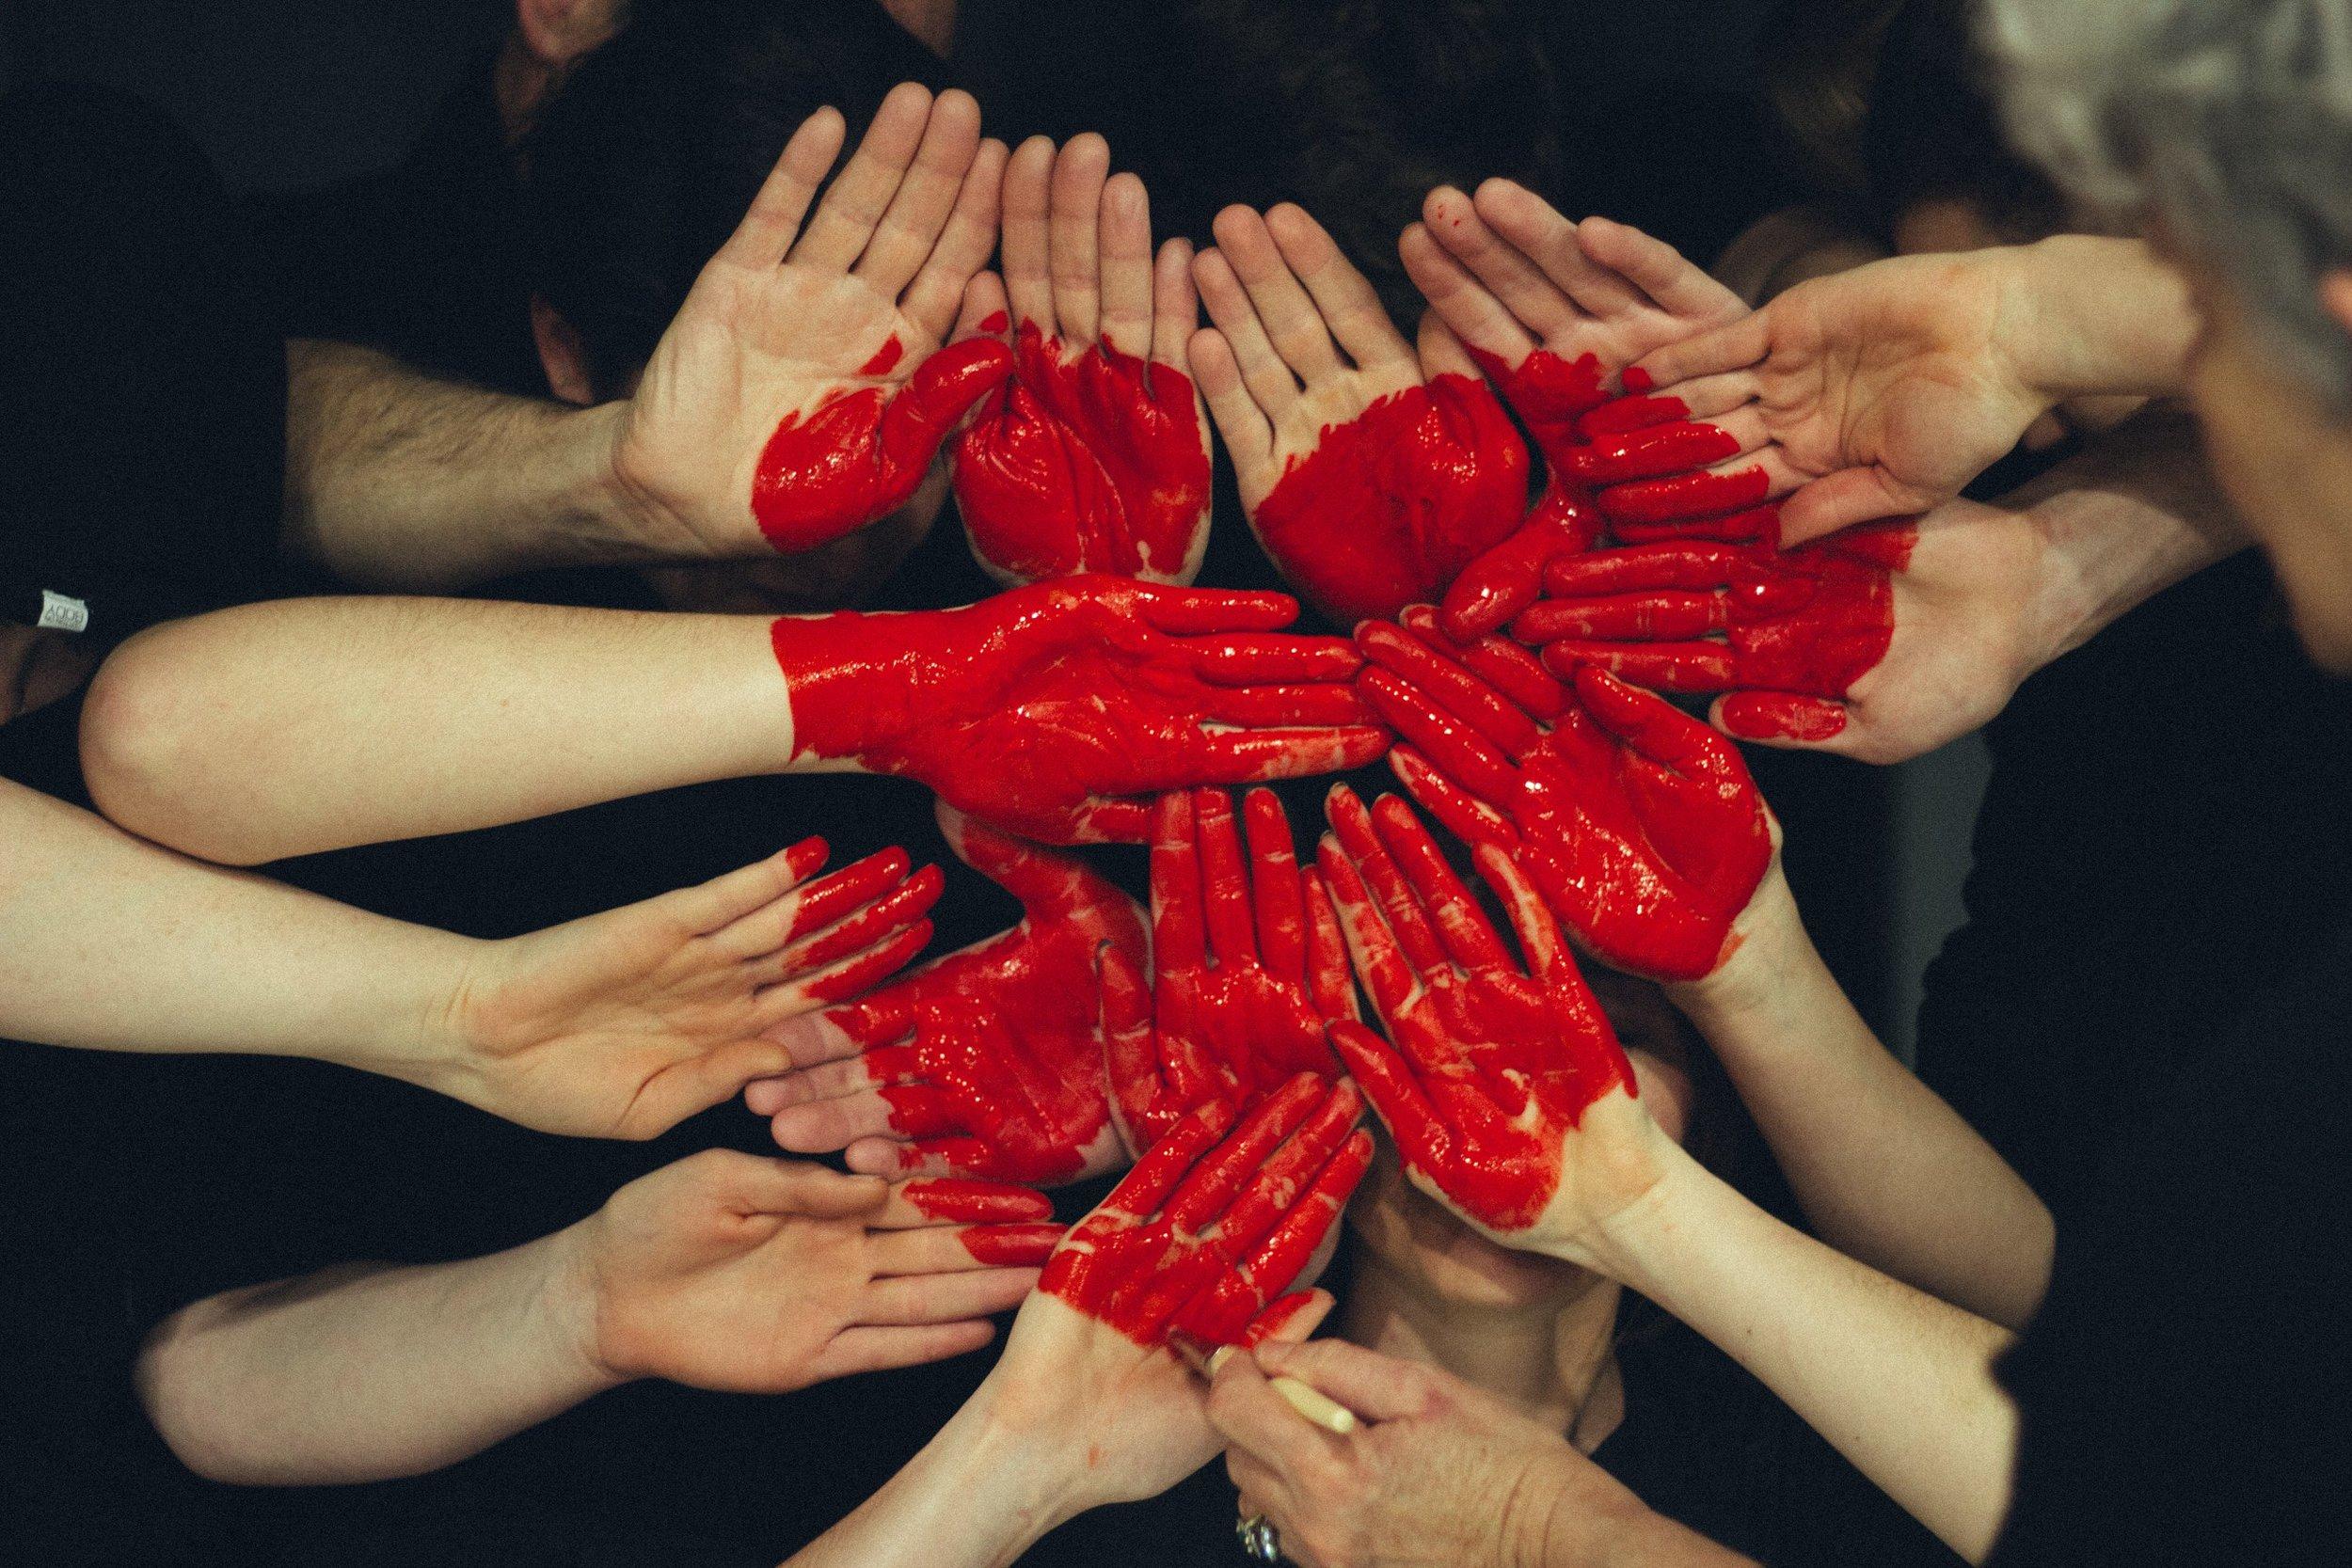 many-hands-heart-tim-marshall-114623-small.jpg